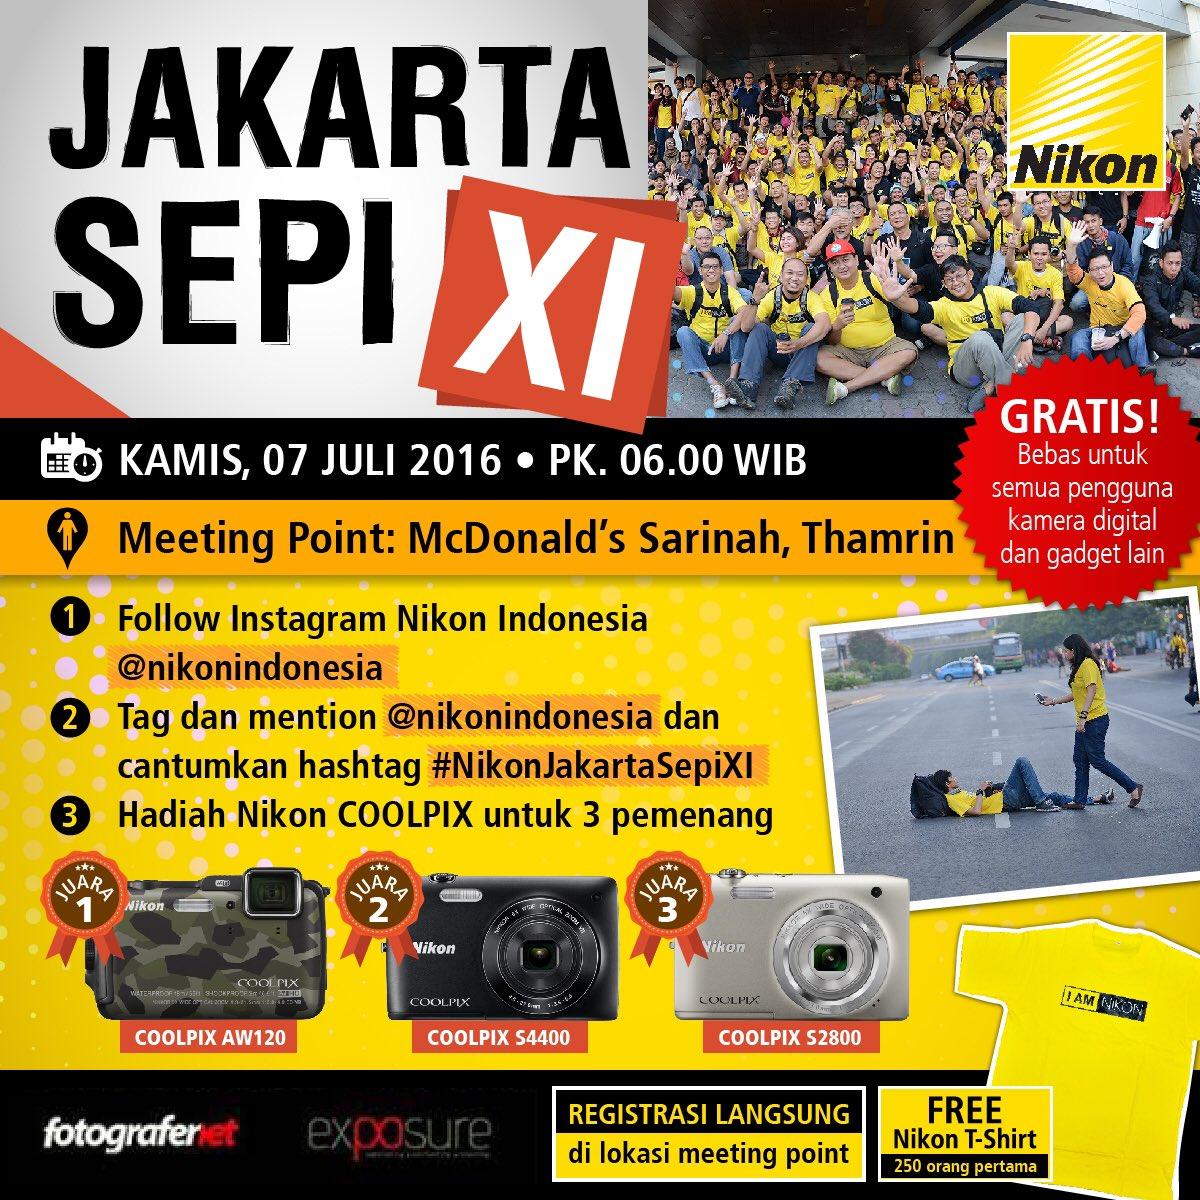 #JakartaSepi2016 + Lomba Foto #NikonJakartaSepiXI Kamis 7 Juli 06:00 McD Sarinah https://t.co/TpYiJF9rSi #FN13 https://t.co/6soy9mYATx